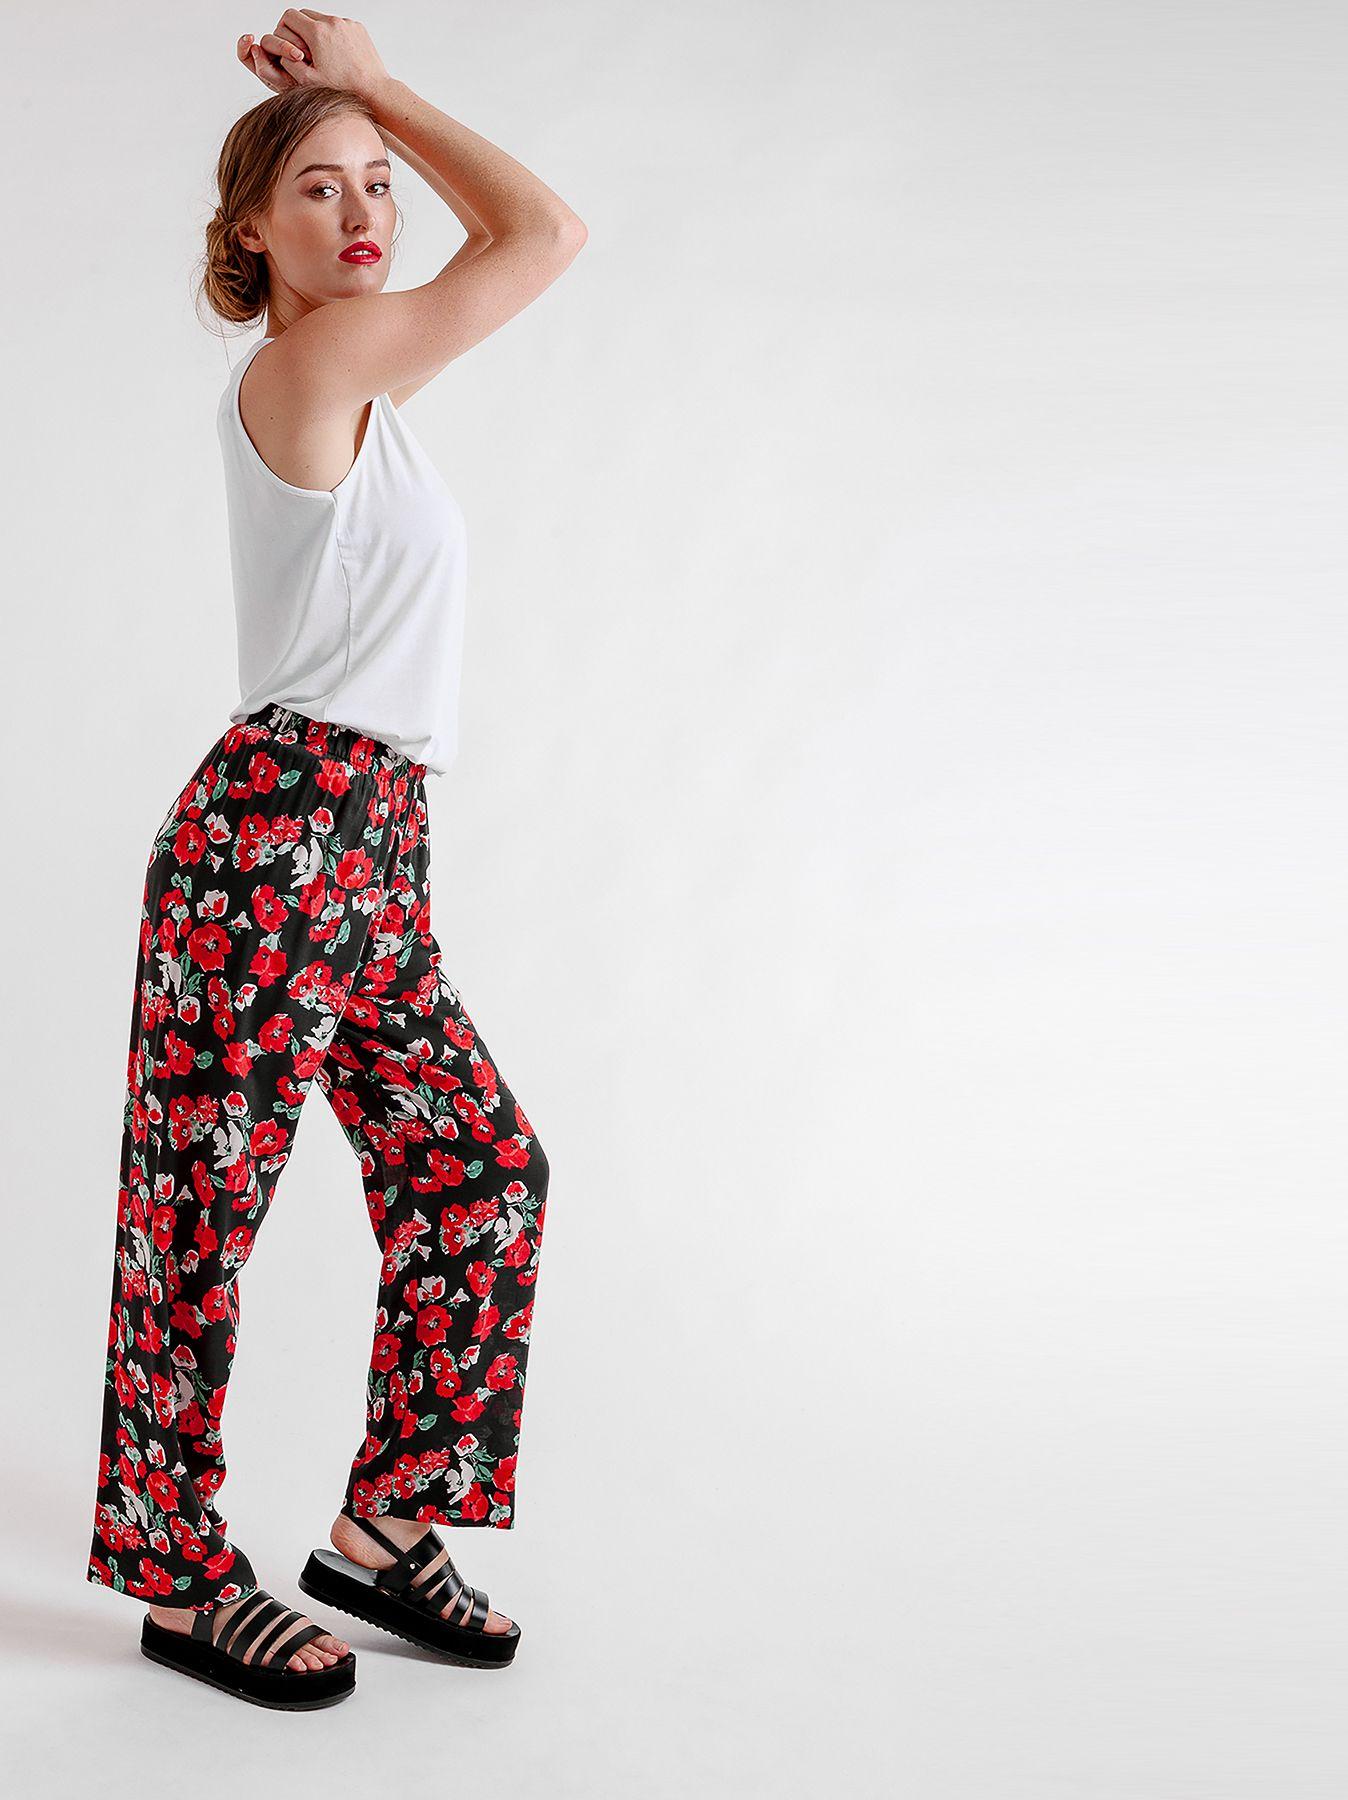 Pantalone elastico FLOWER PRINT